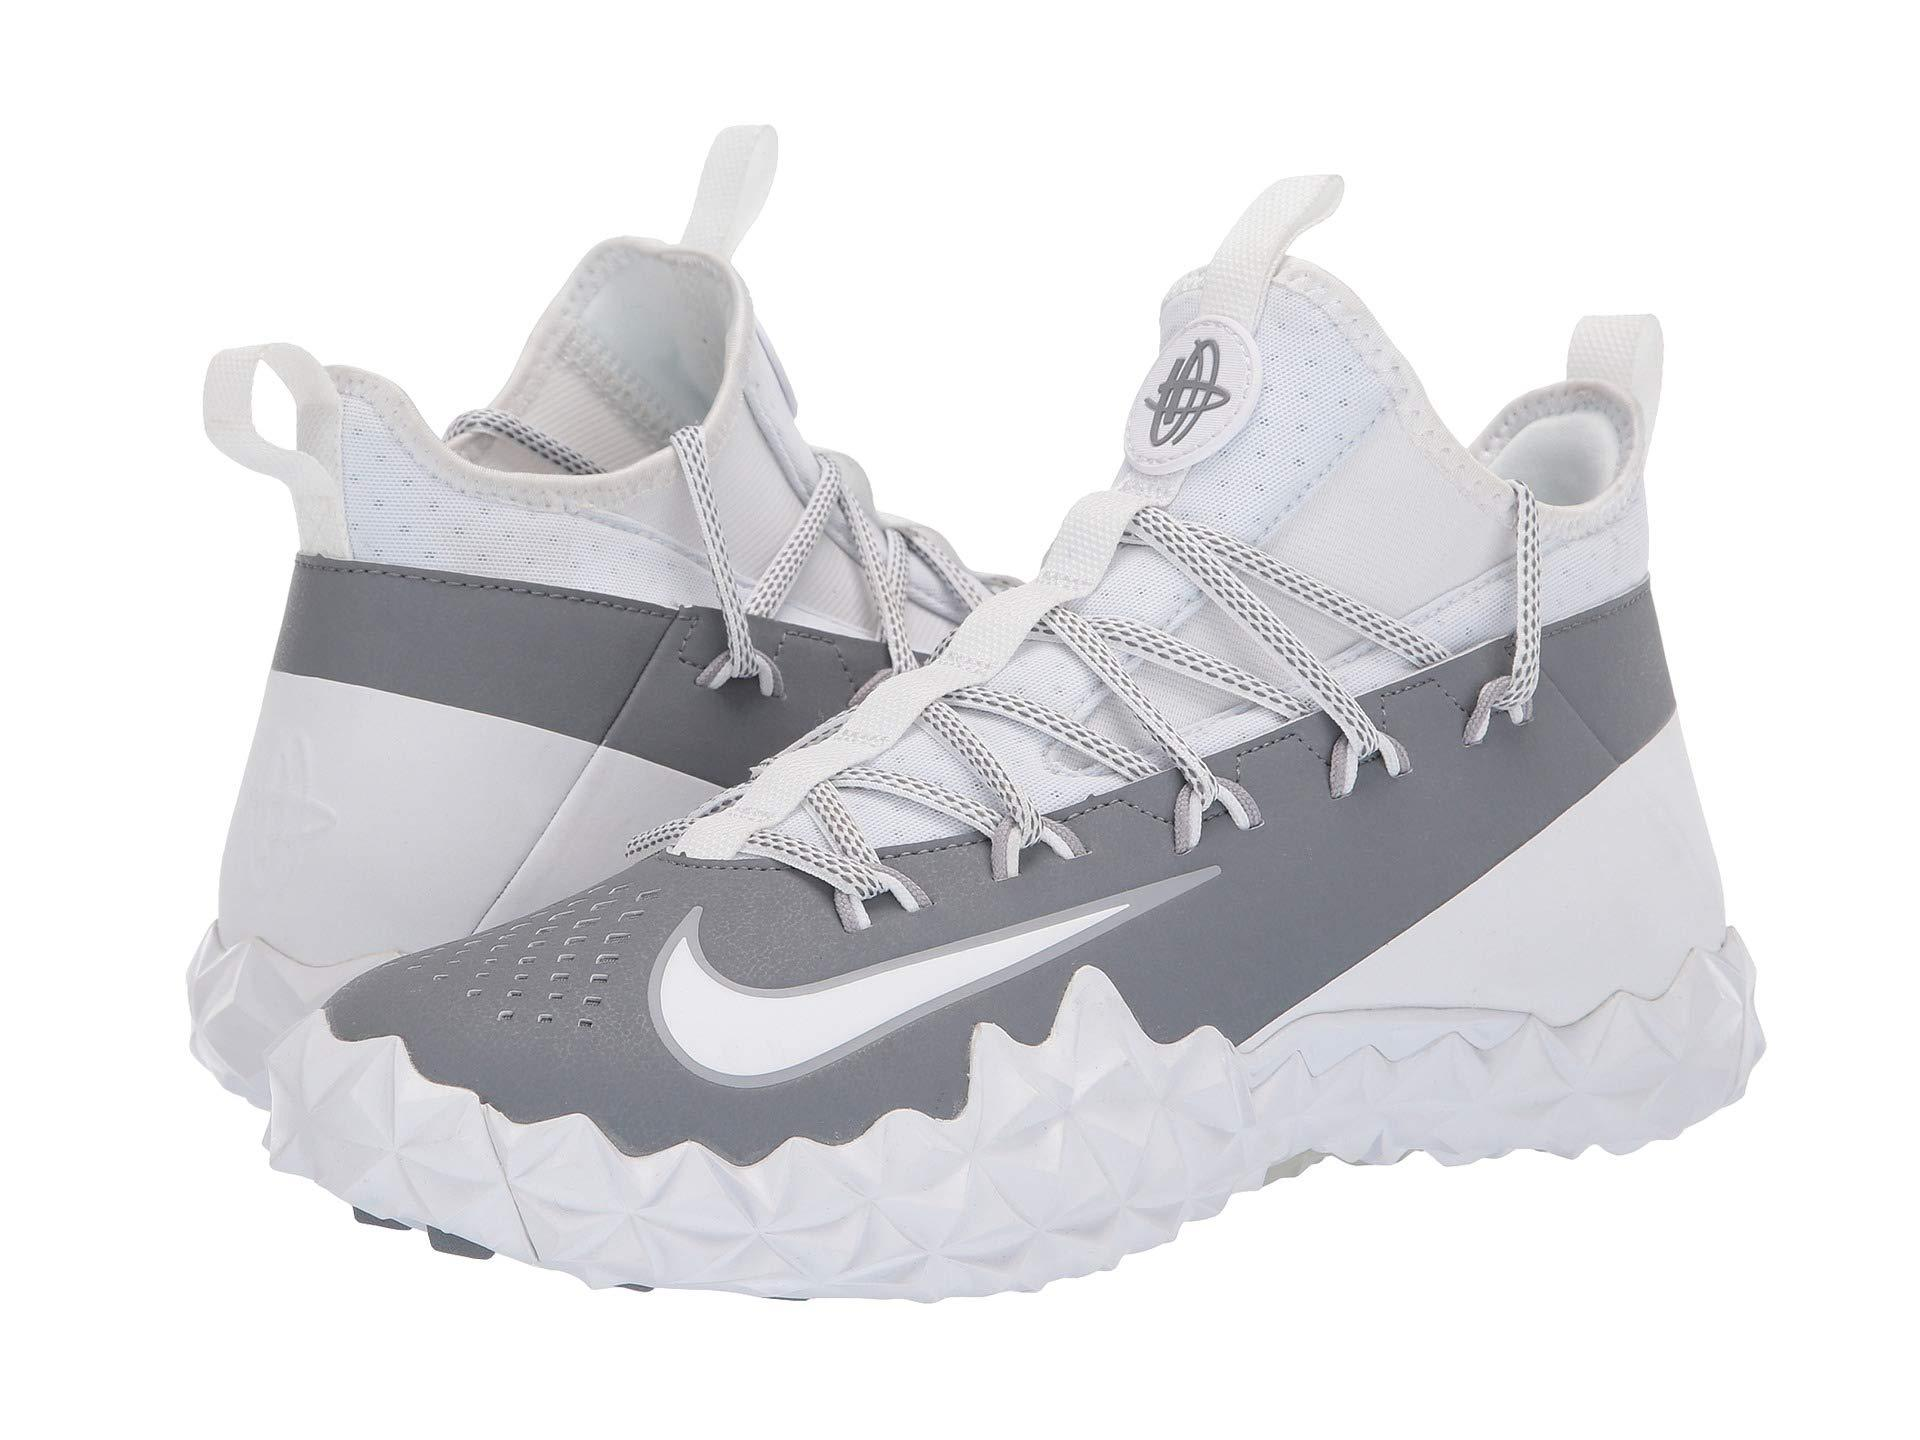 0c71f845527 Lyst - Nike Alpha Huarache 6 Elt Turf Lax (white white cool Grey ...